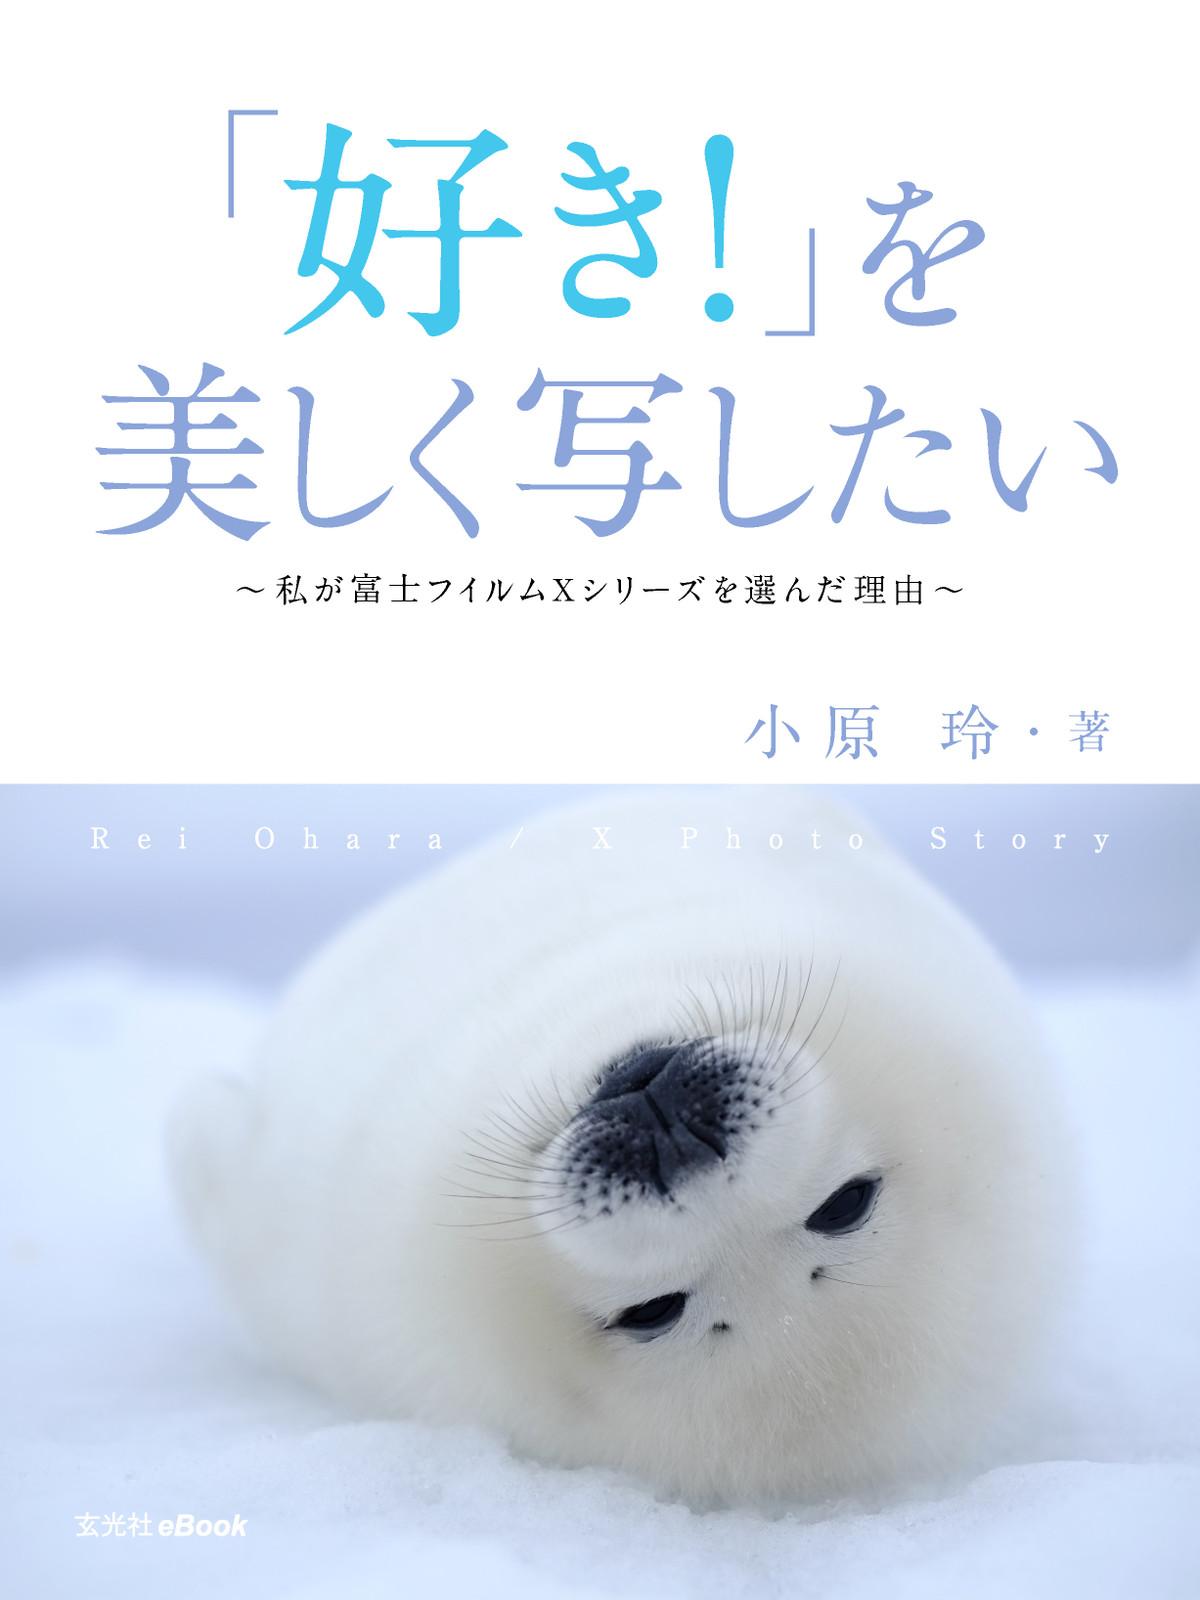 Ohara_ebook__01